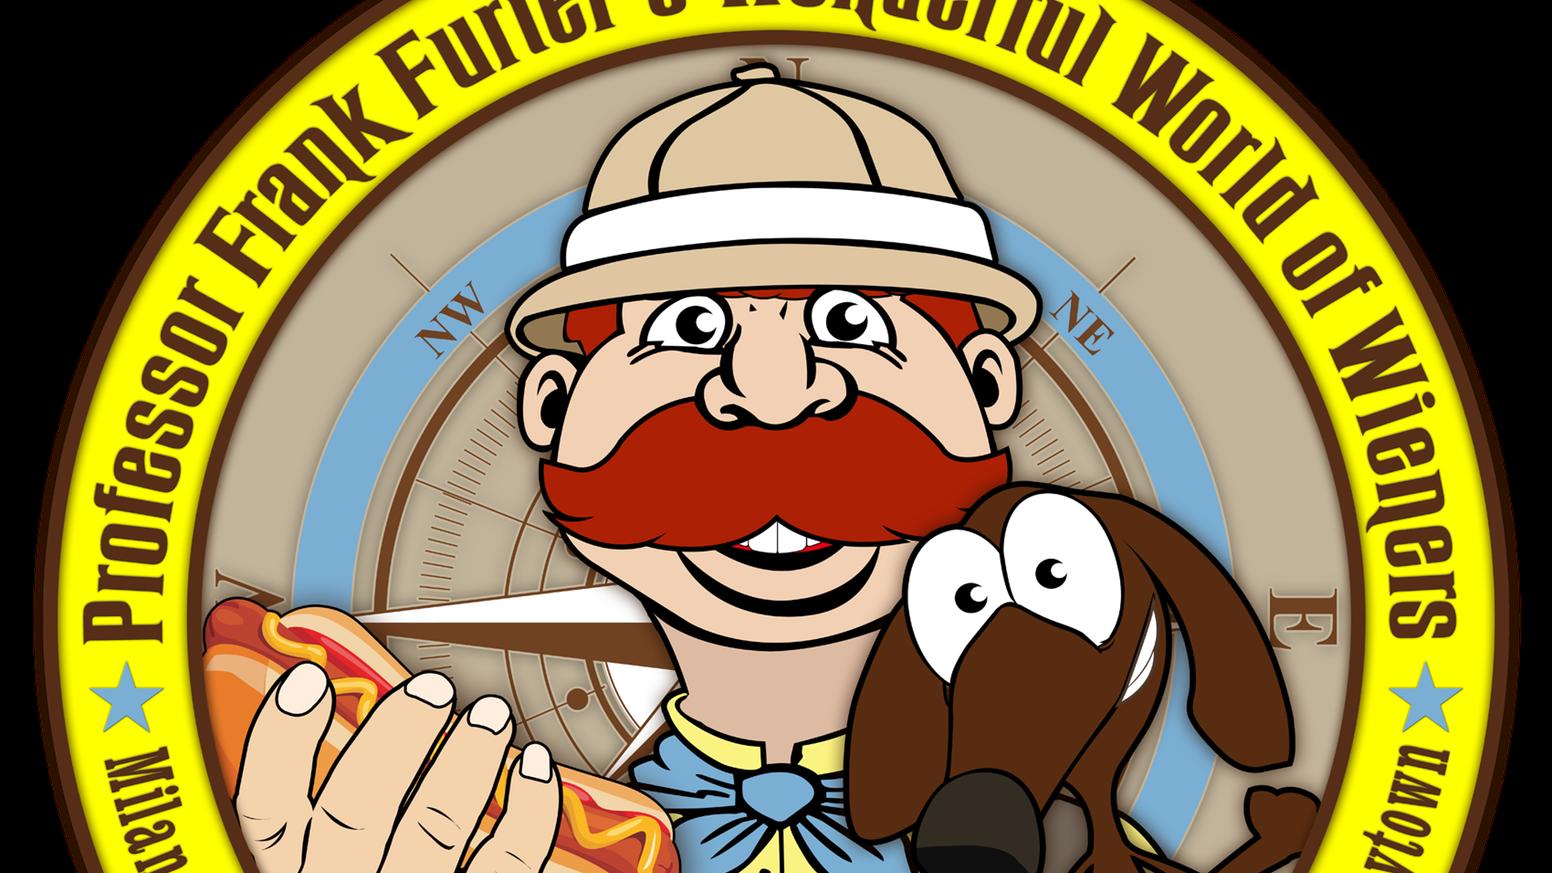 Hotdog clipart frank. Professor furter s wonderful